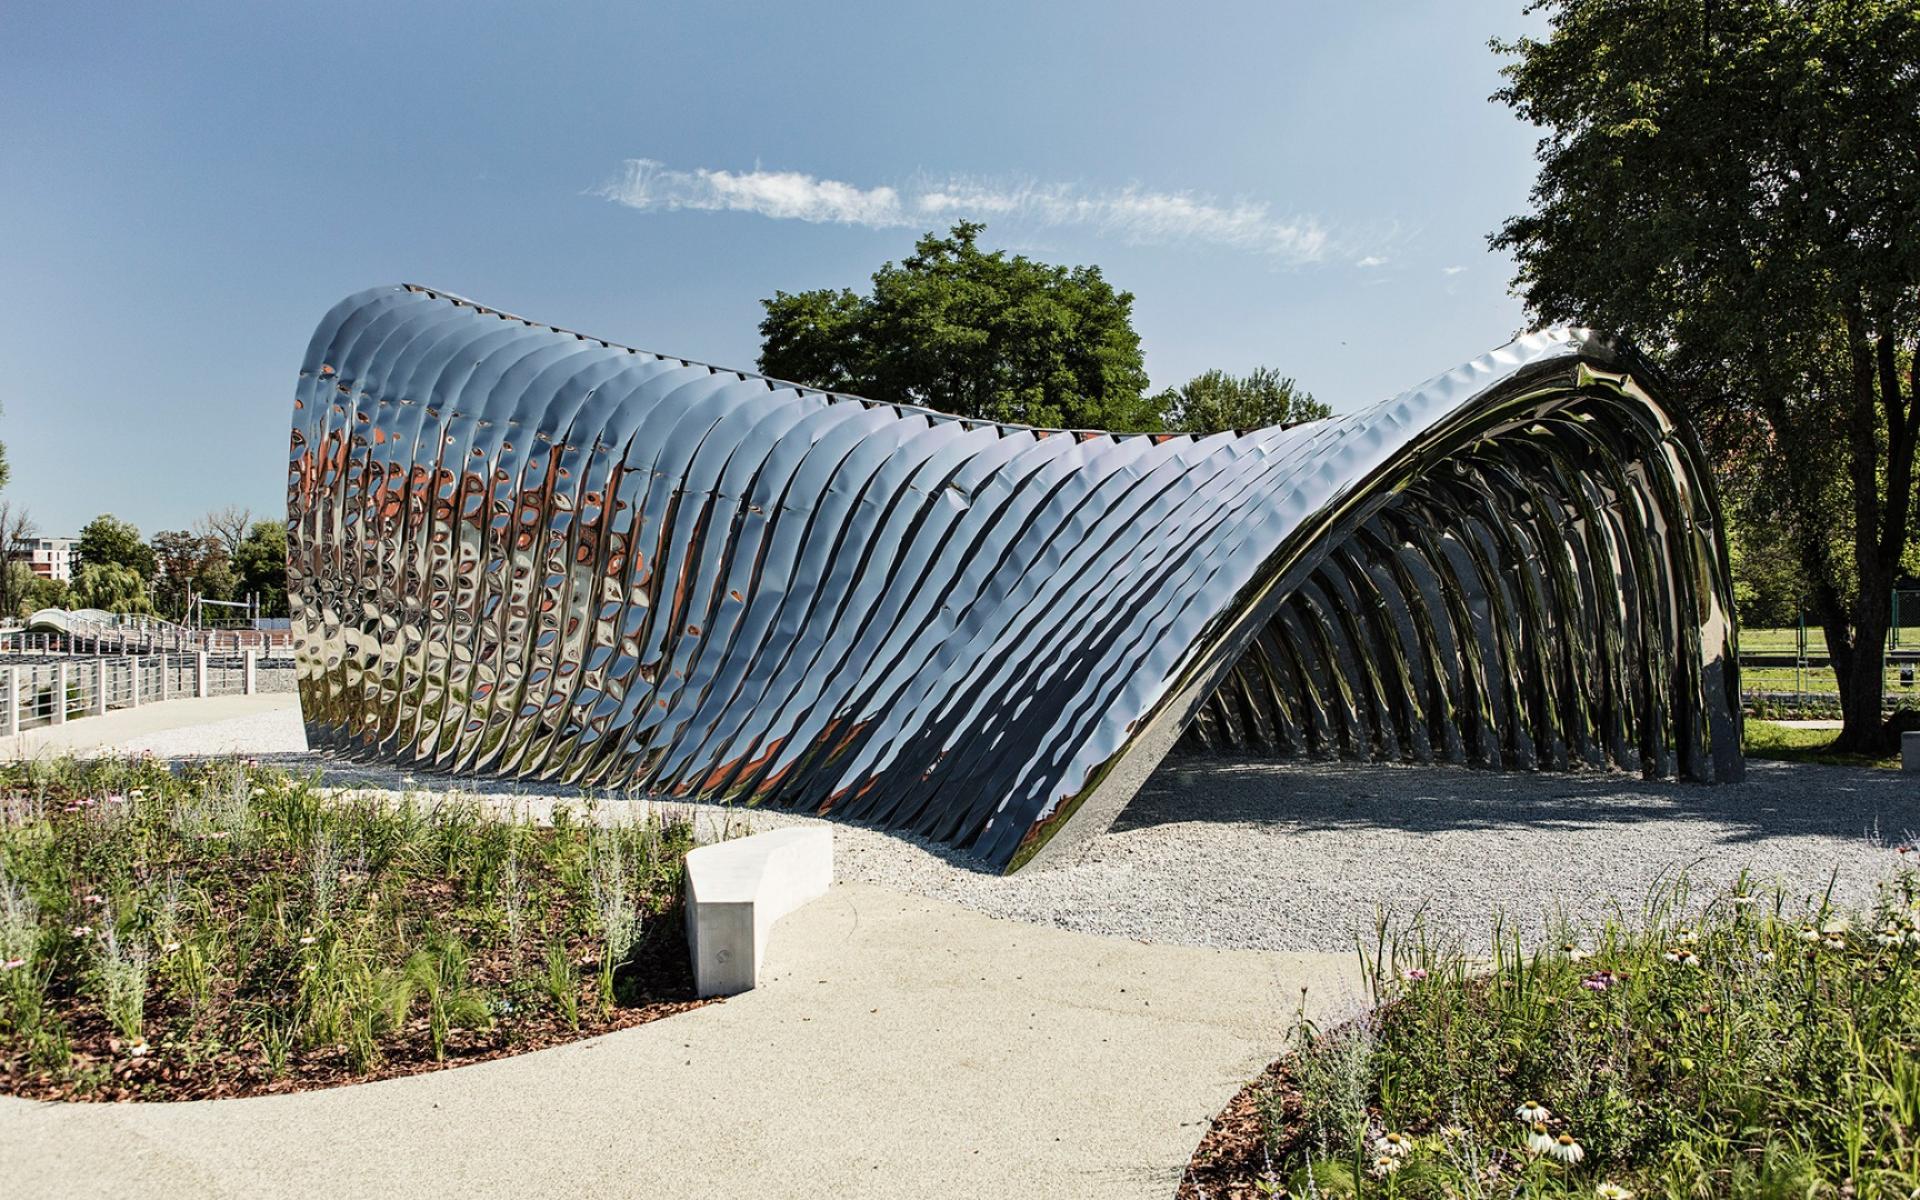 Mies Award 2019 Nawa public sculpture zieta